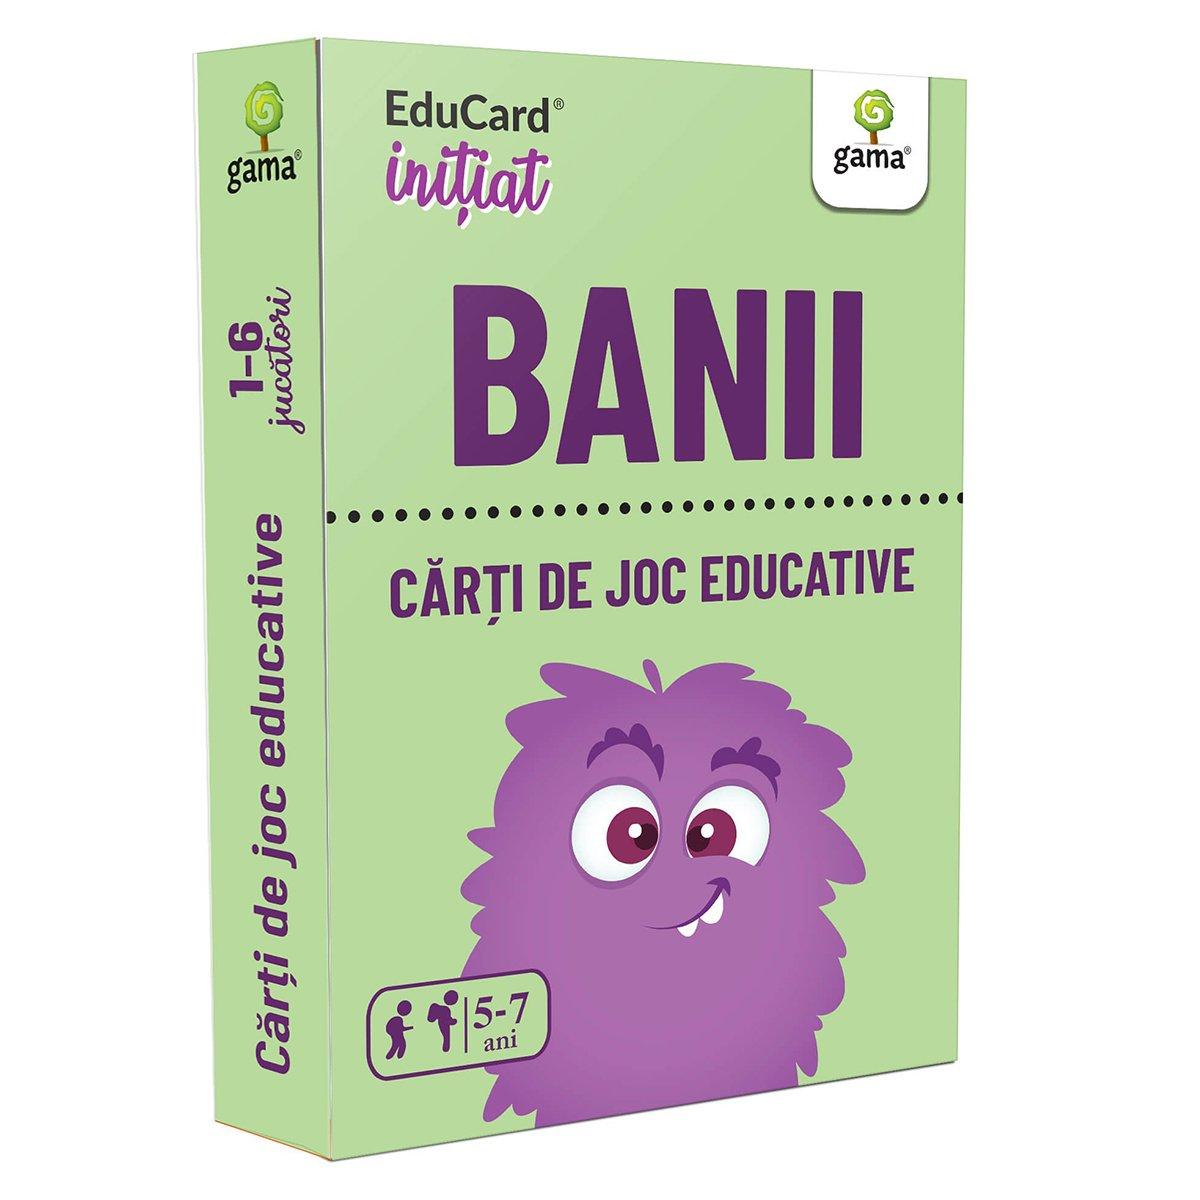 Editura Gama, Carti de joc educative Initiat, Banii